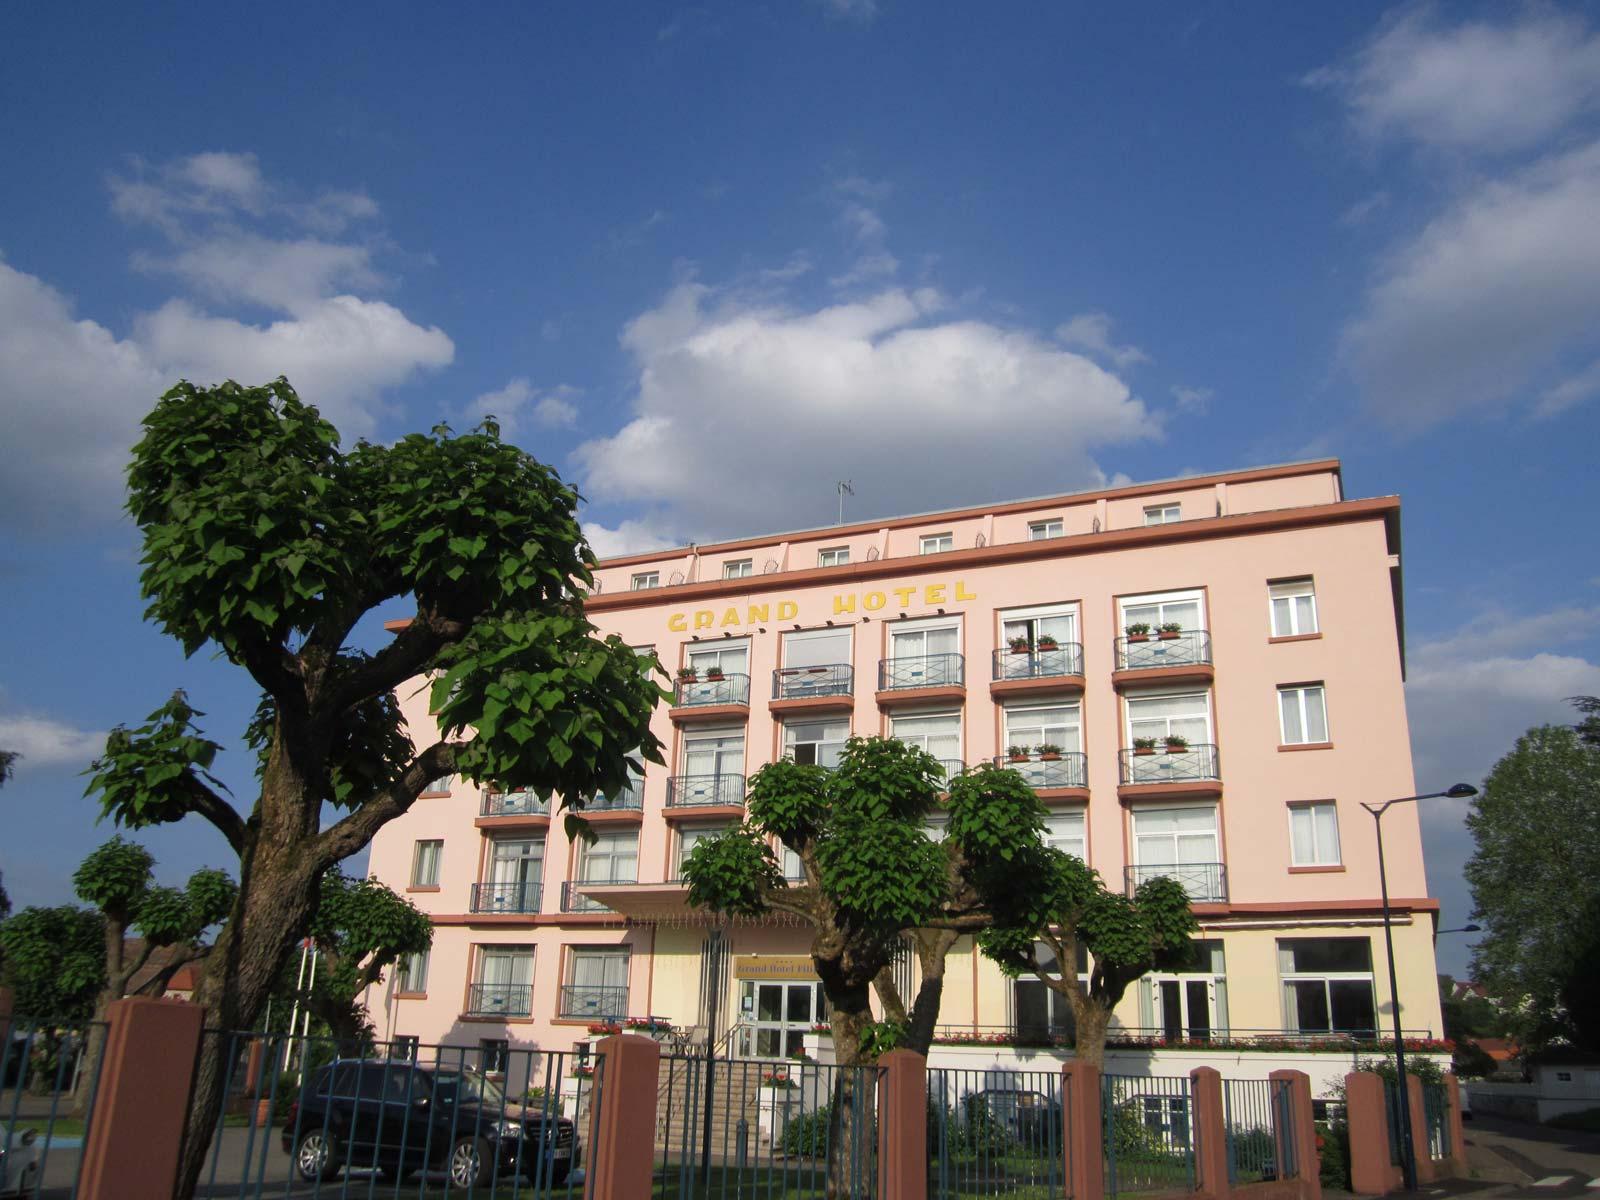 Grand Hôtel Filippo, Niederbronn-les-Bains, Alsace